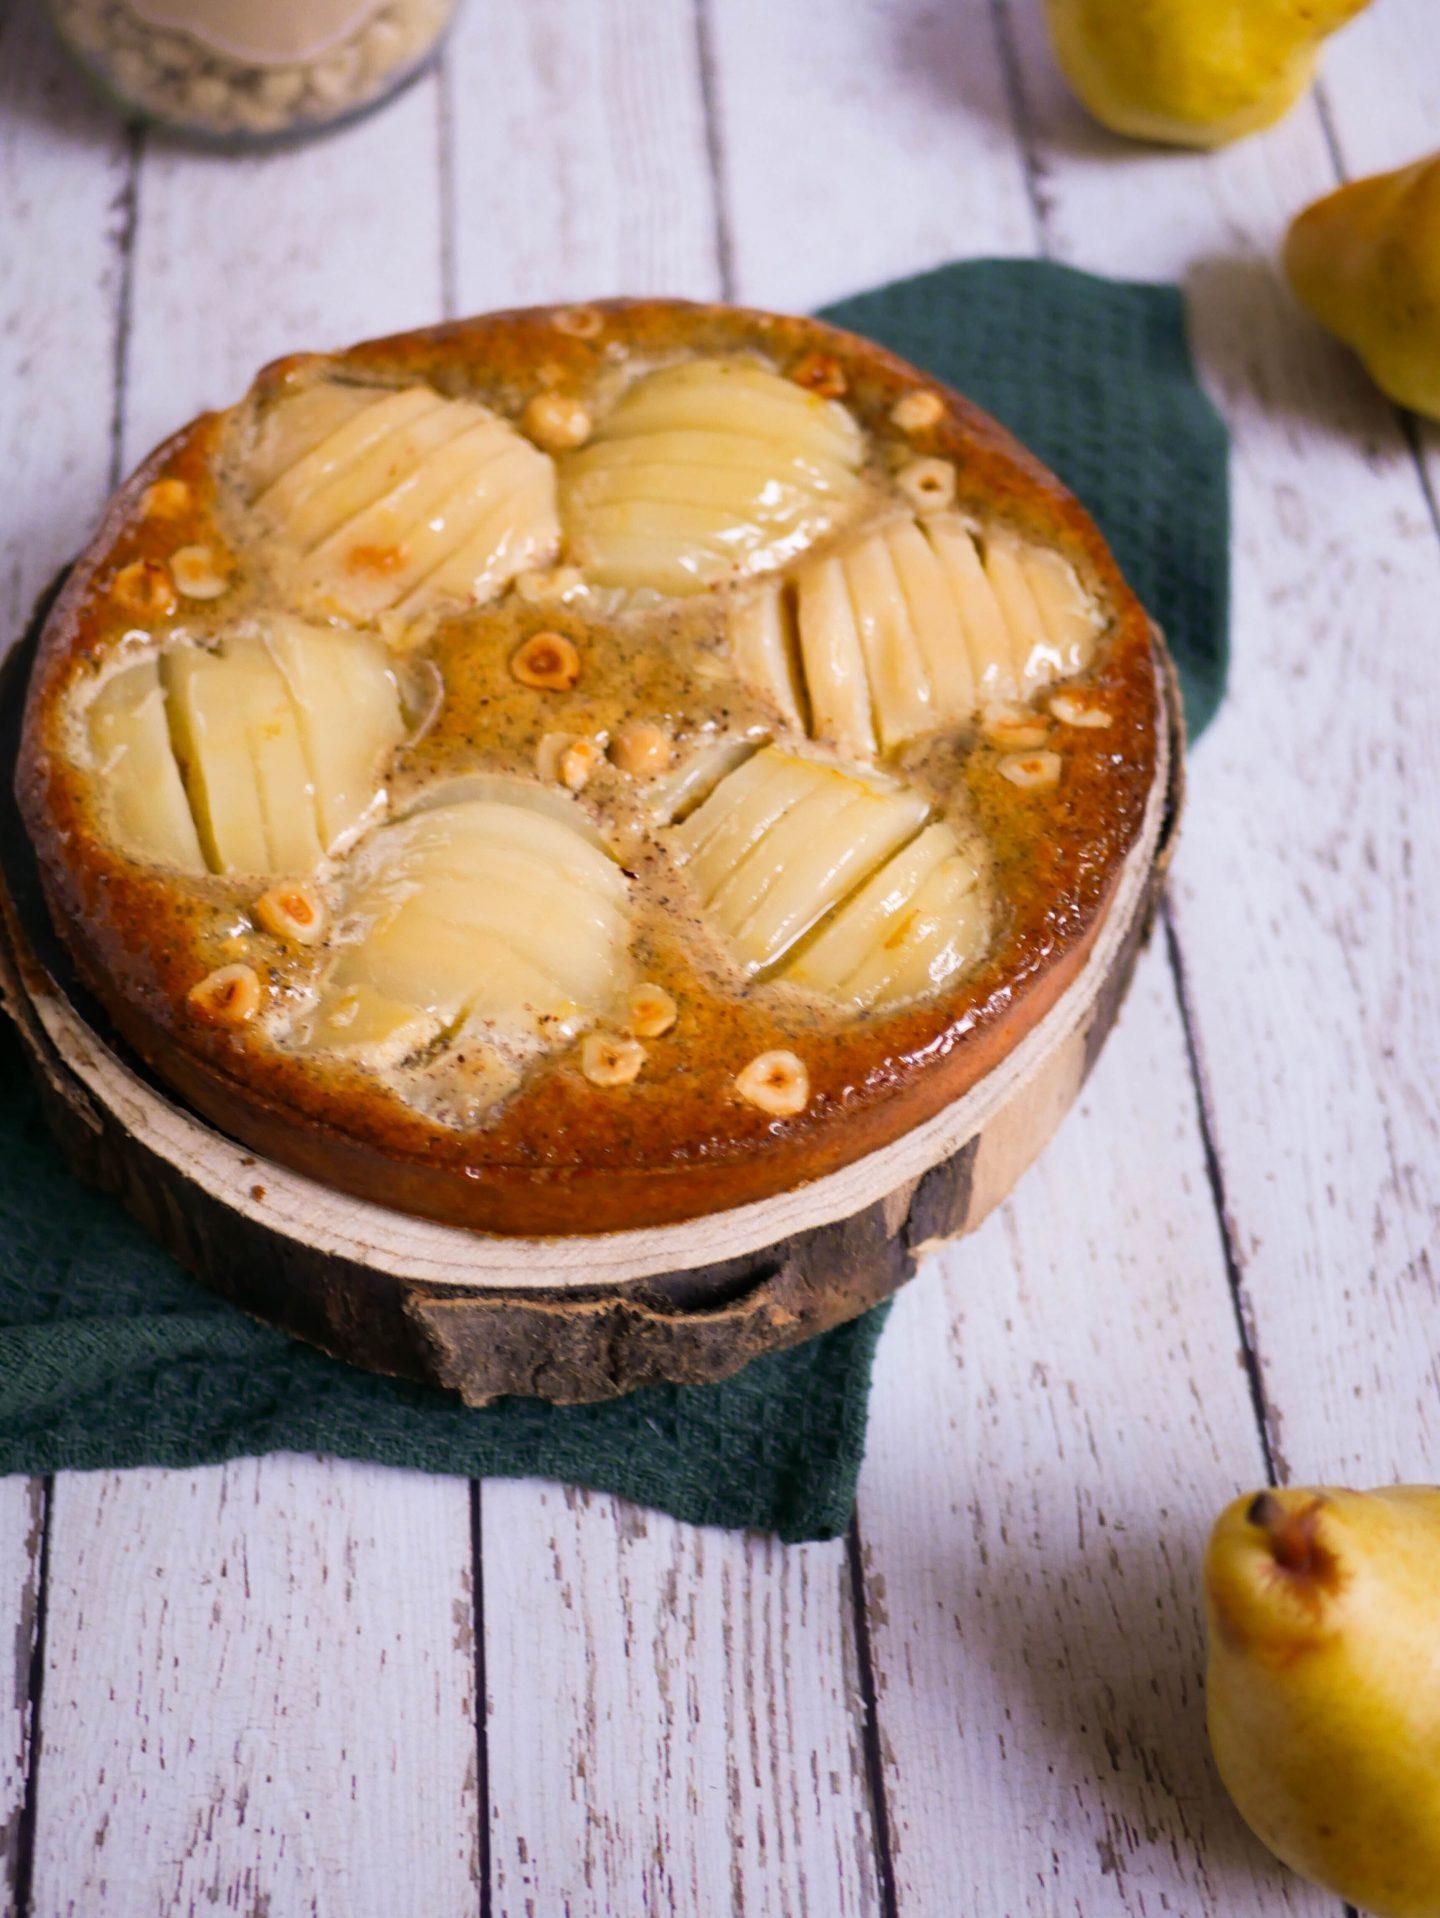 Image de la tarte poire tonka pour illustrer la recette de tarte poire tonka